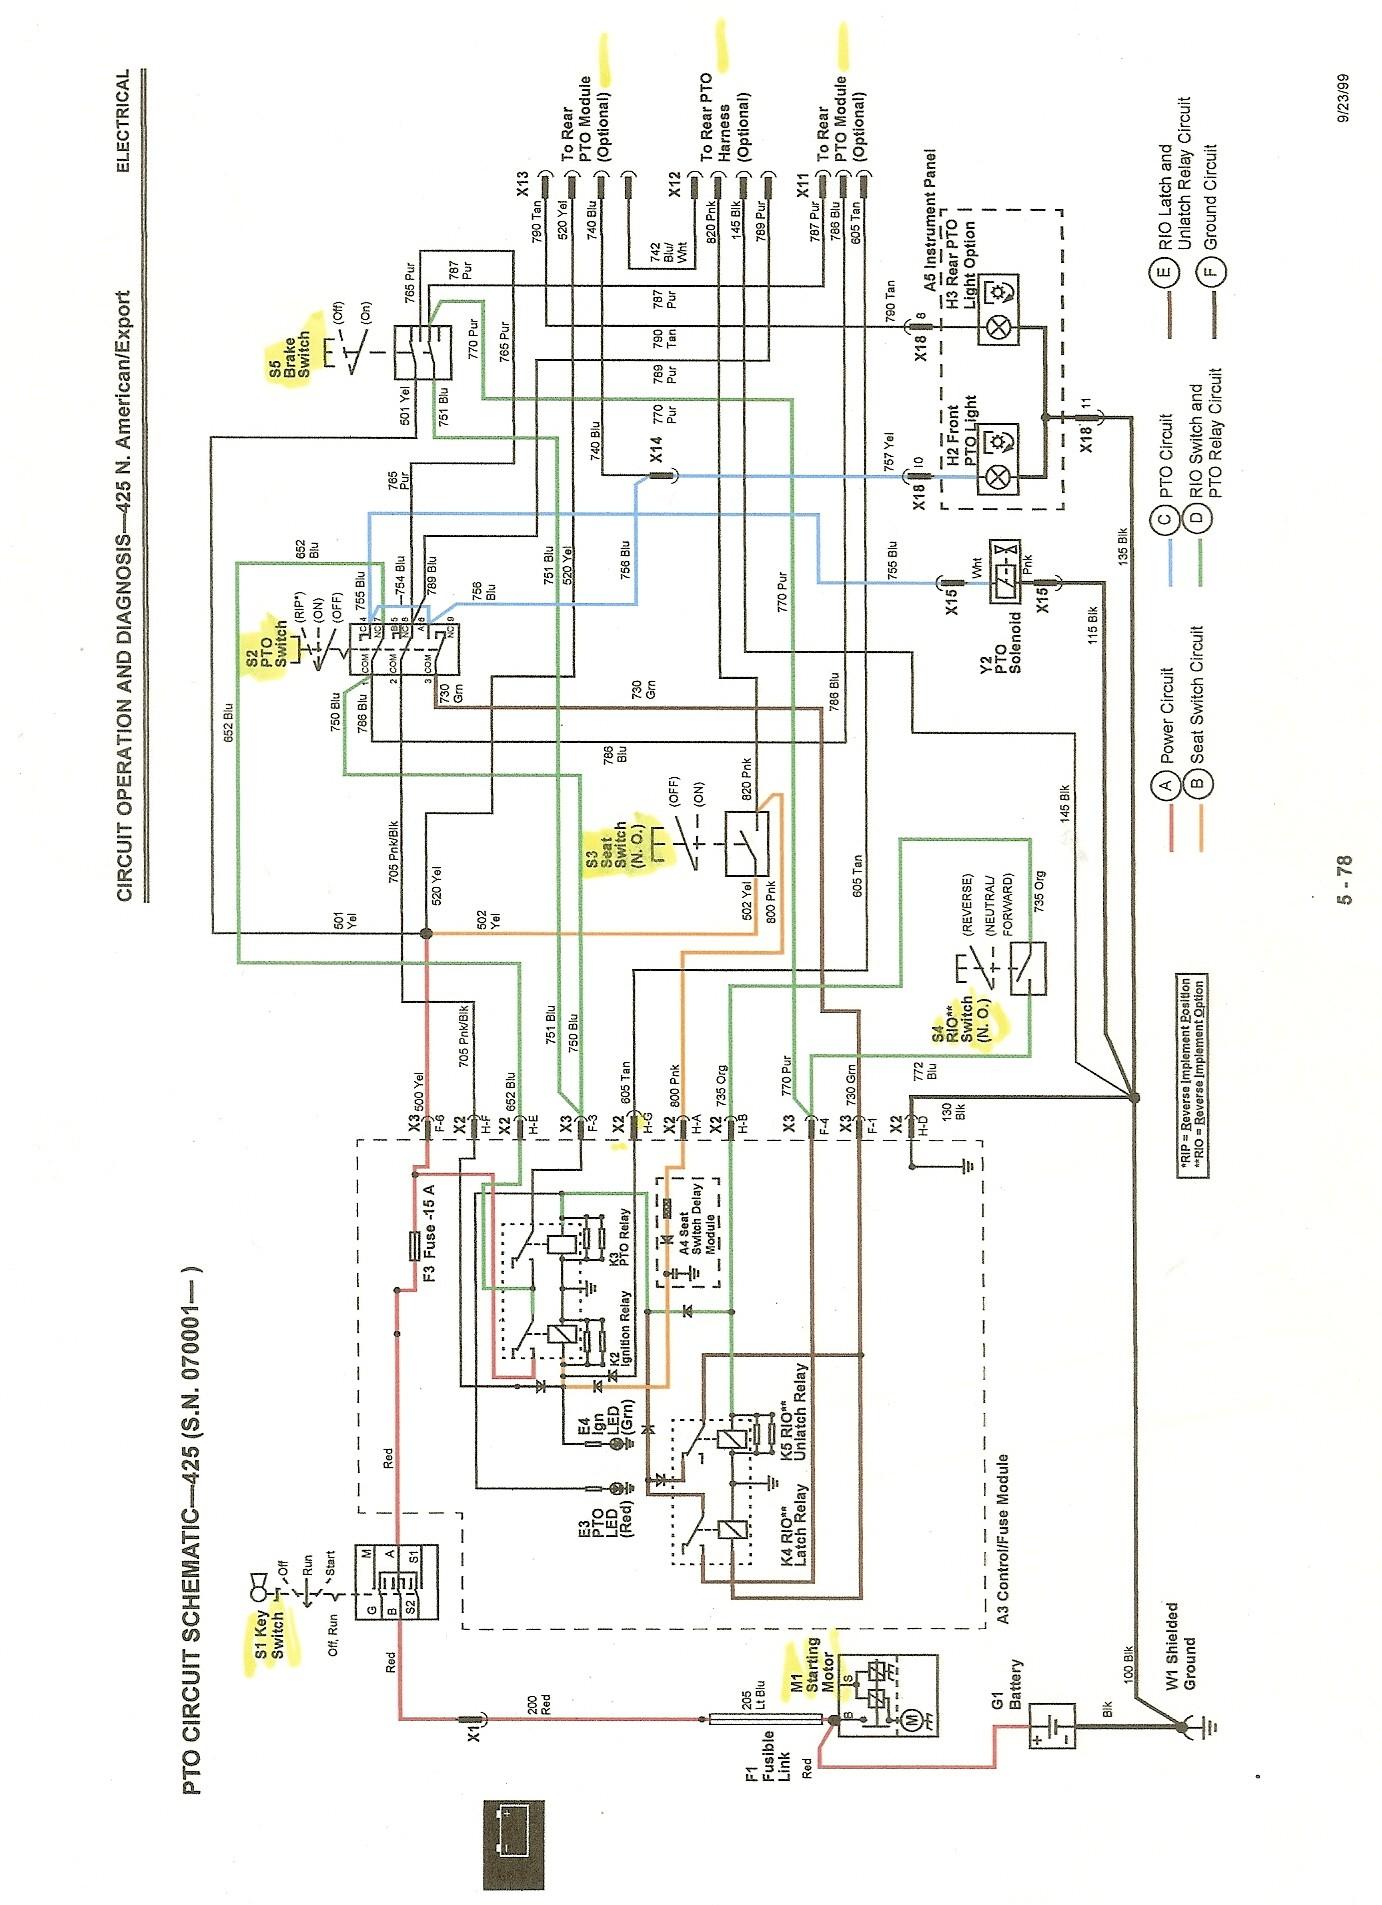 John Deere 345 Wiring Schematic 425 Ignition Motor Cranks when Key is Turned to Run Of John Deere 345 Wiring Schematic